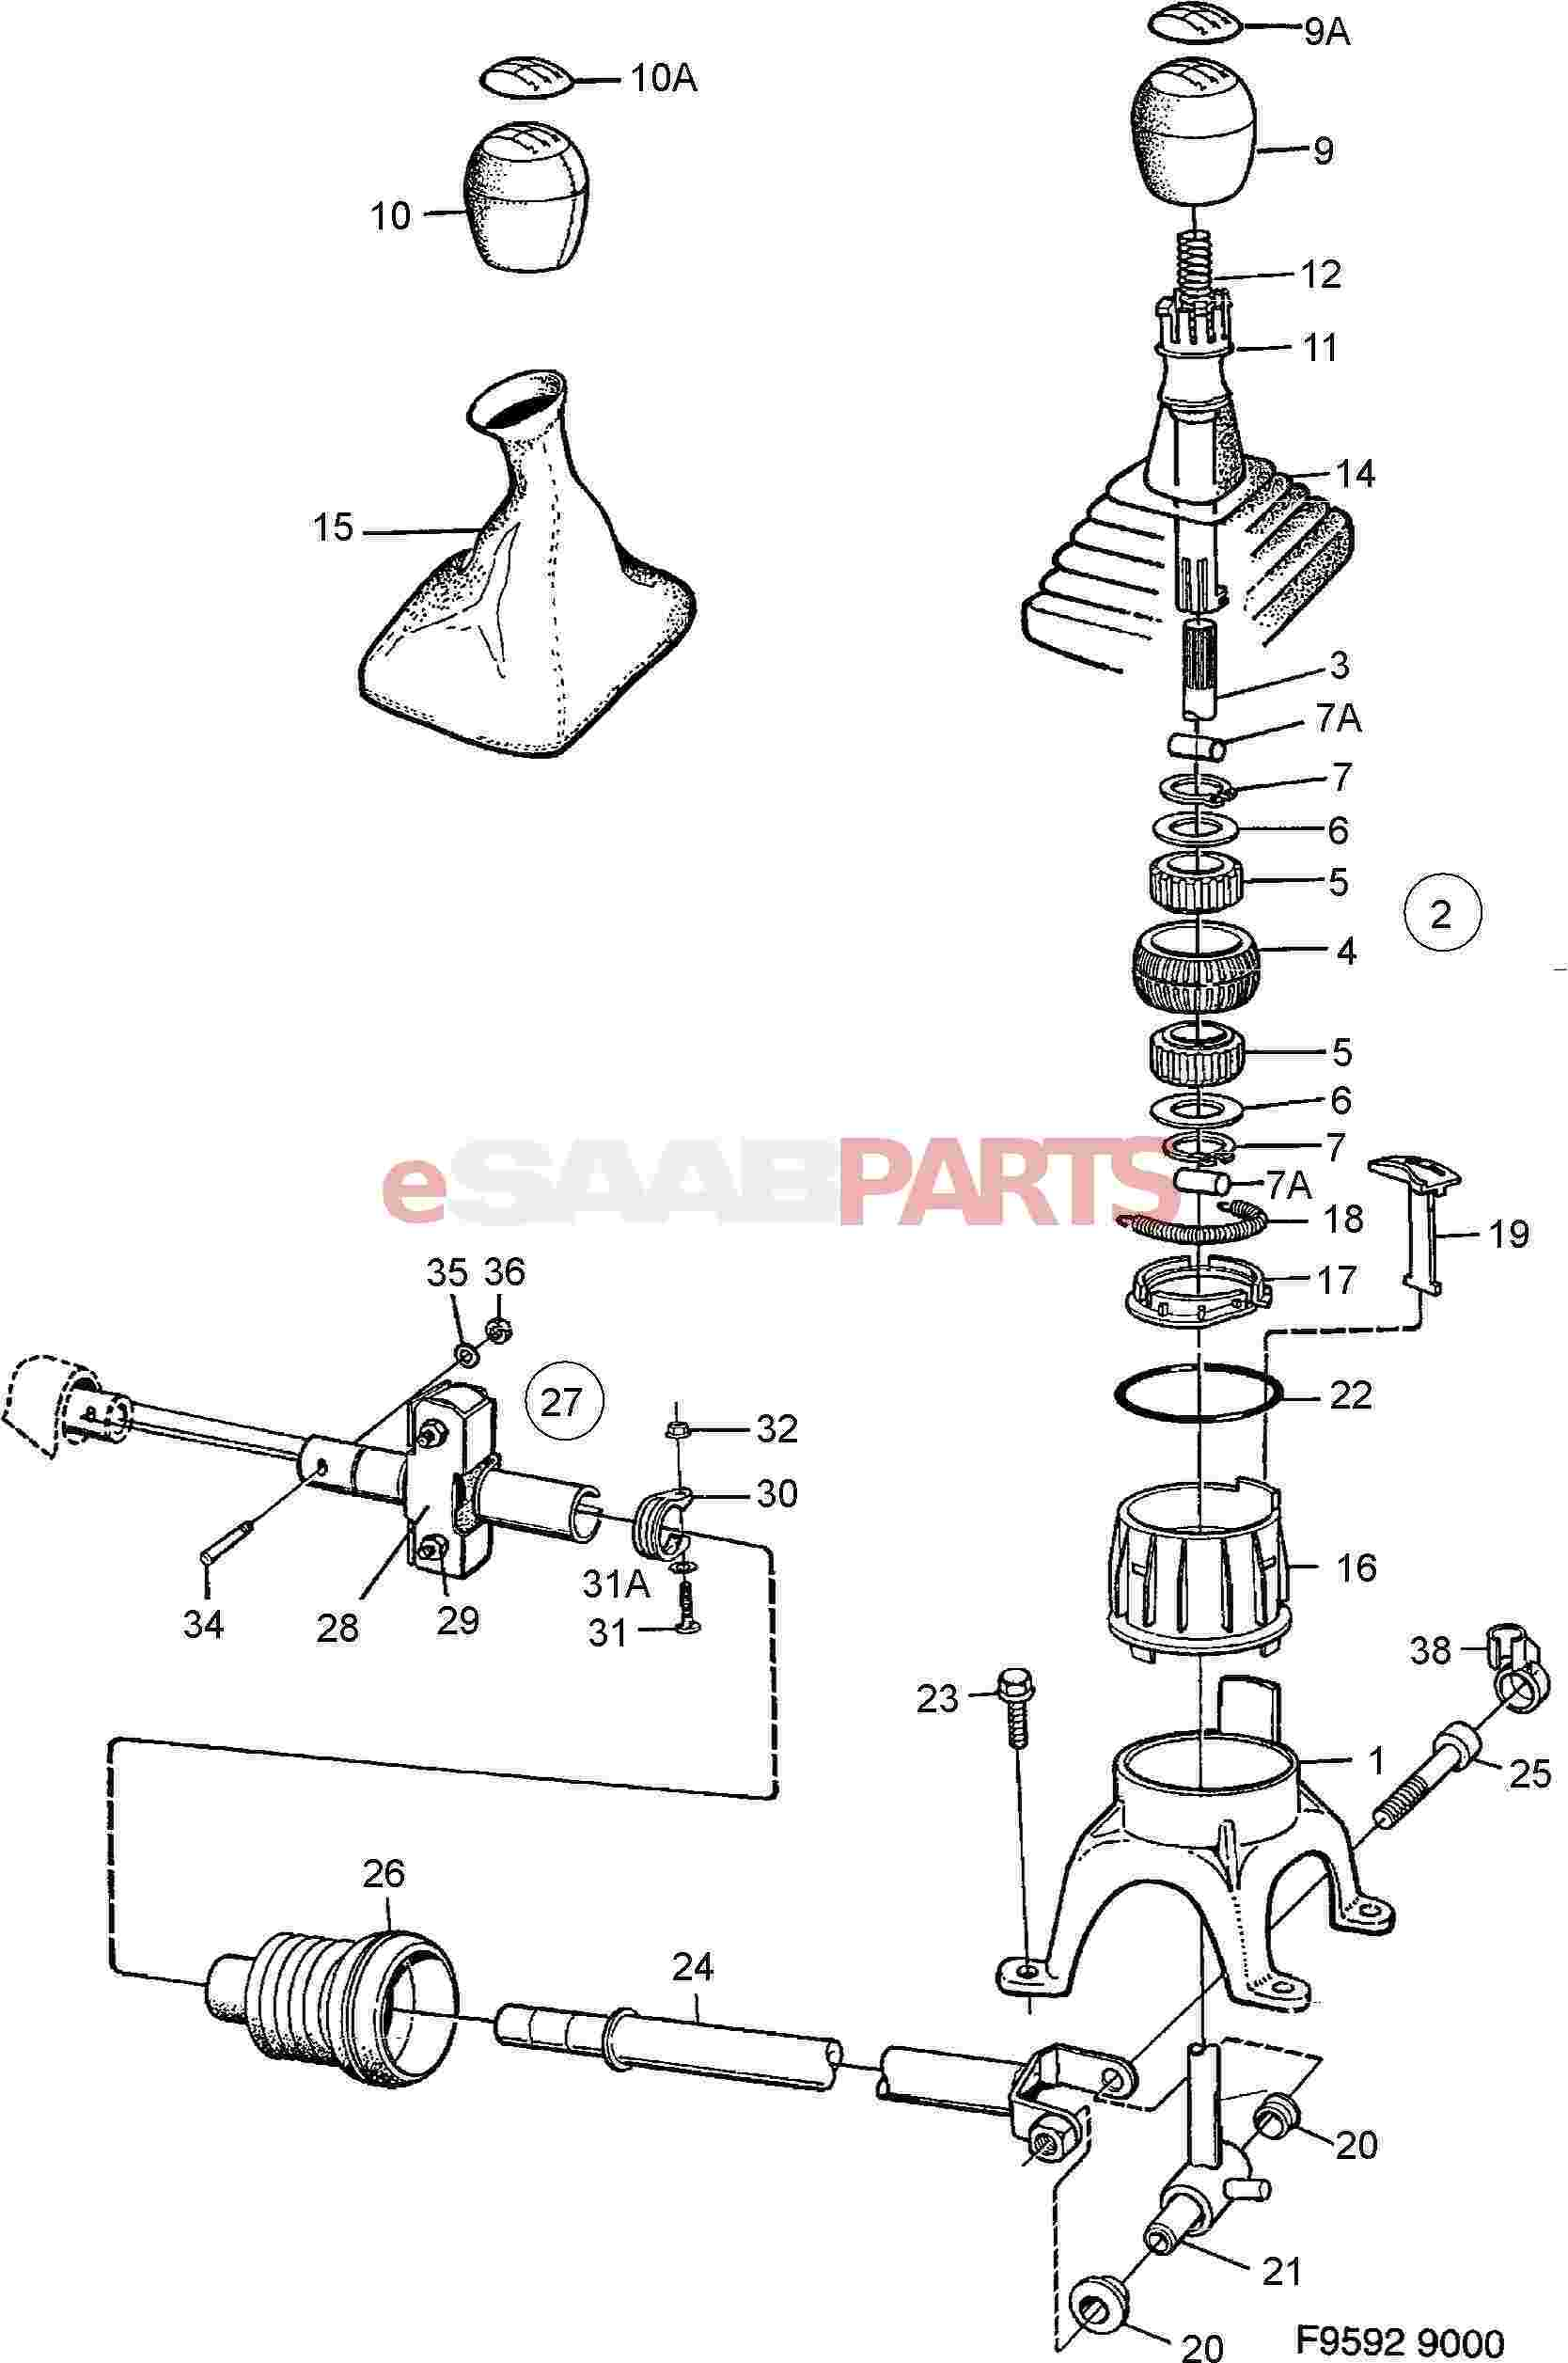 hight resolution of esaabparts com saab 9000 transmission parts transmission manual gear shift lever